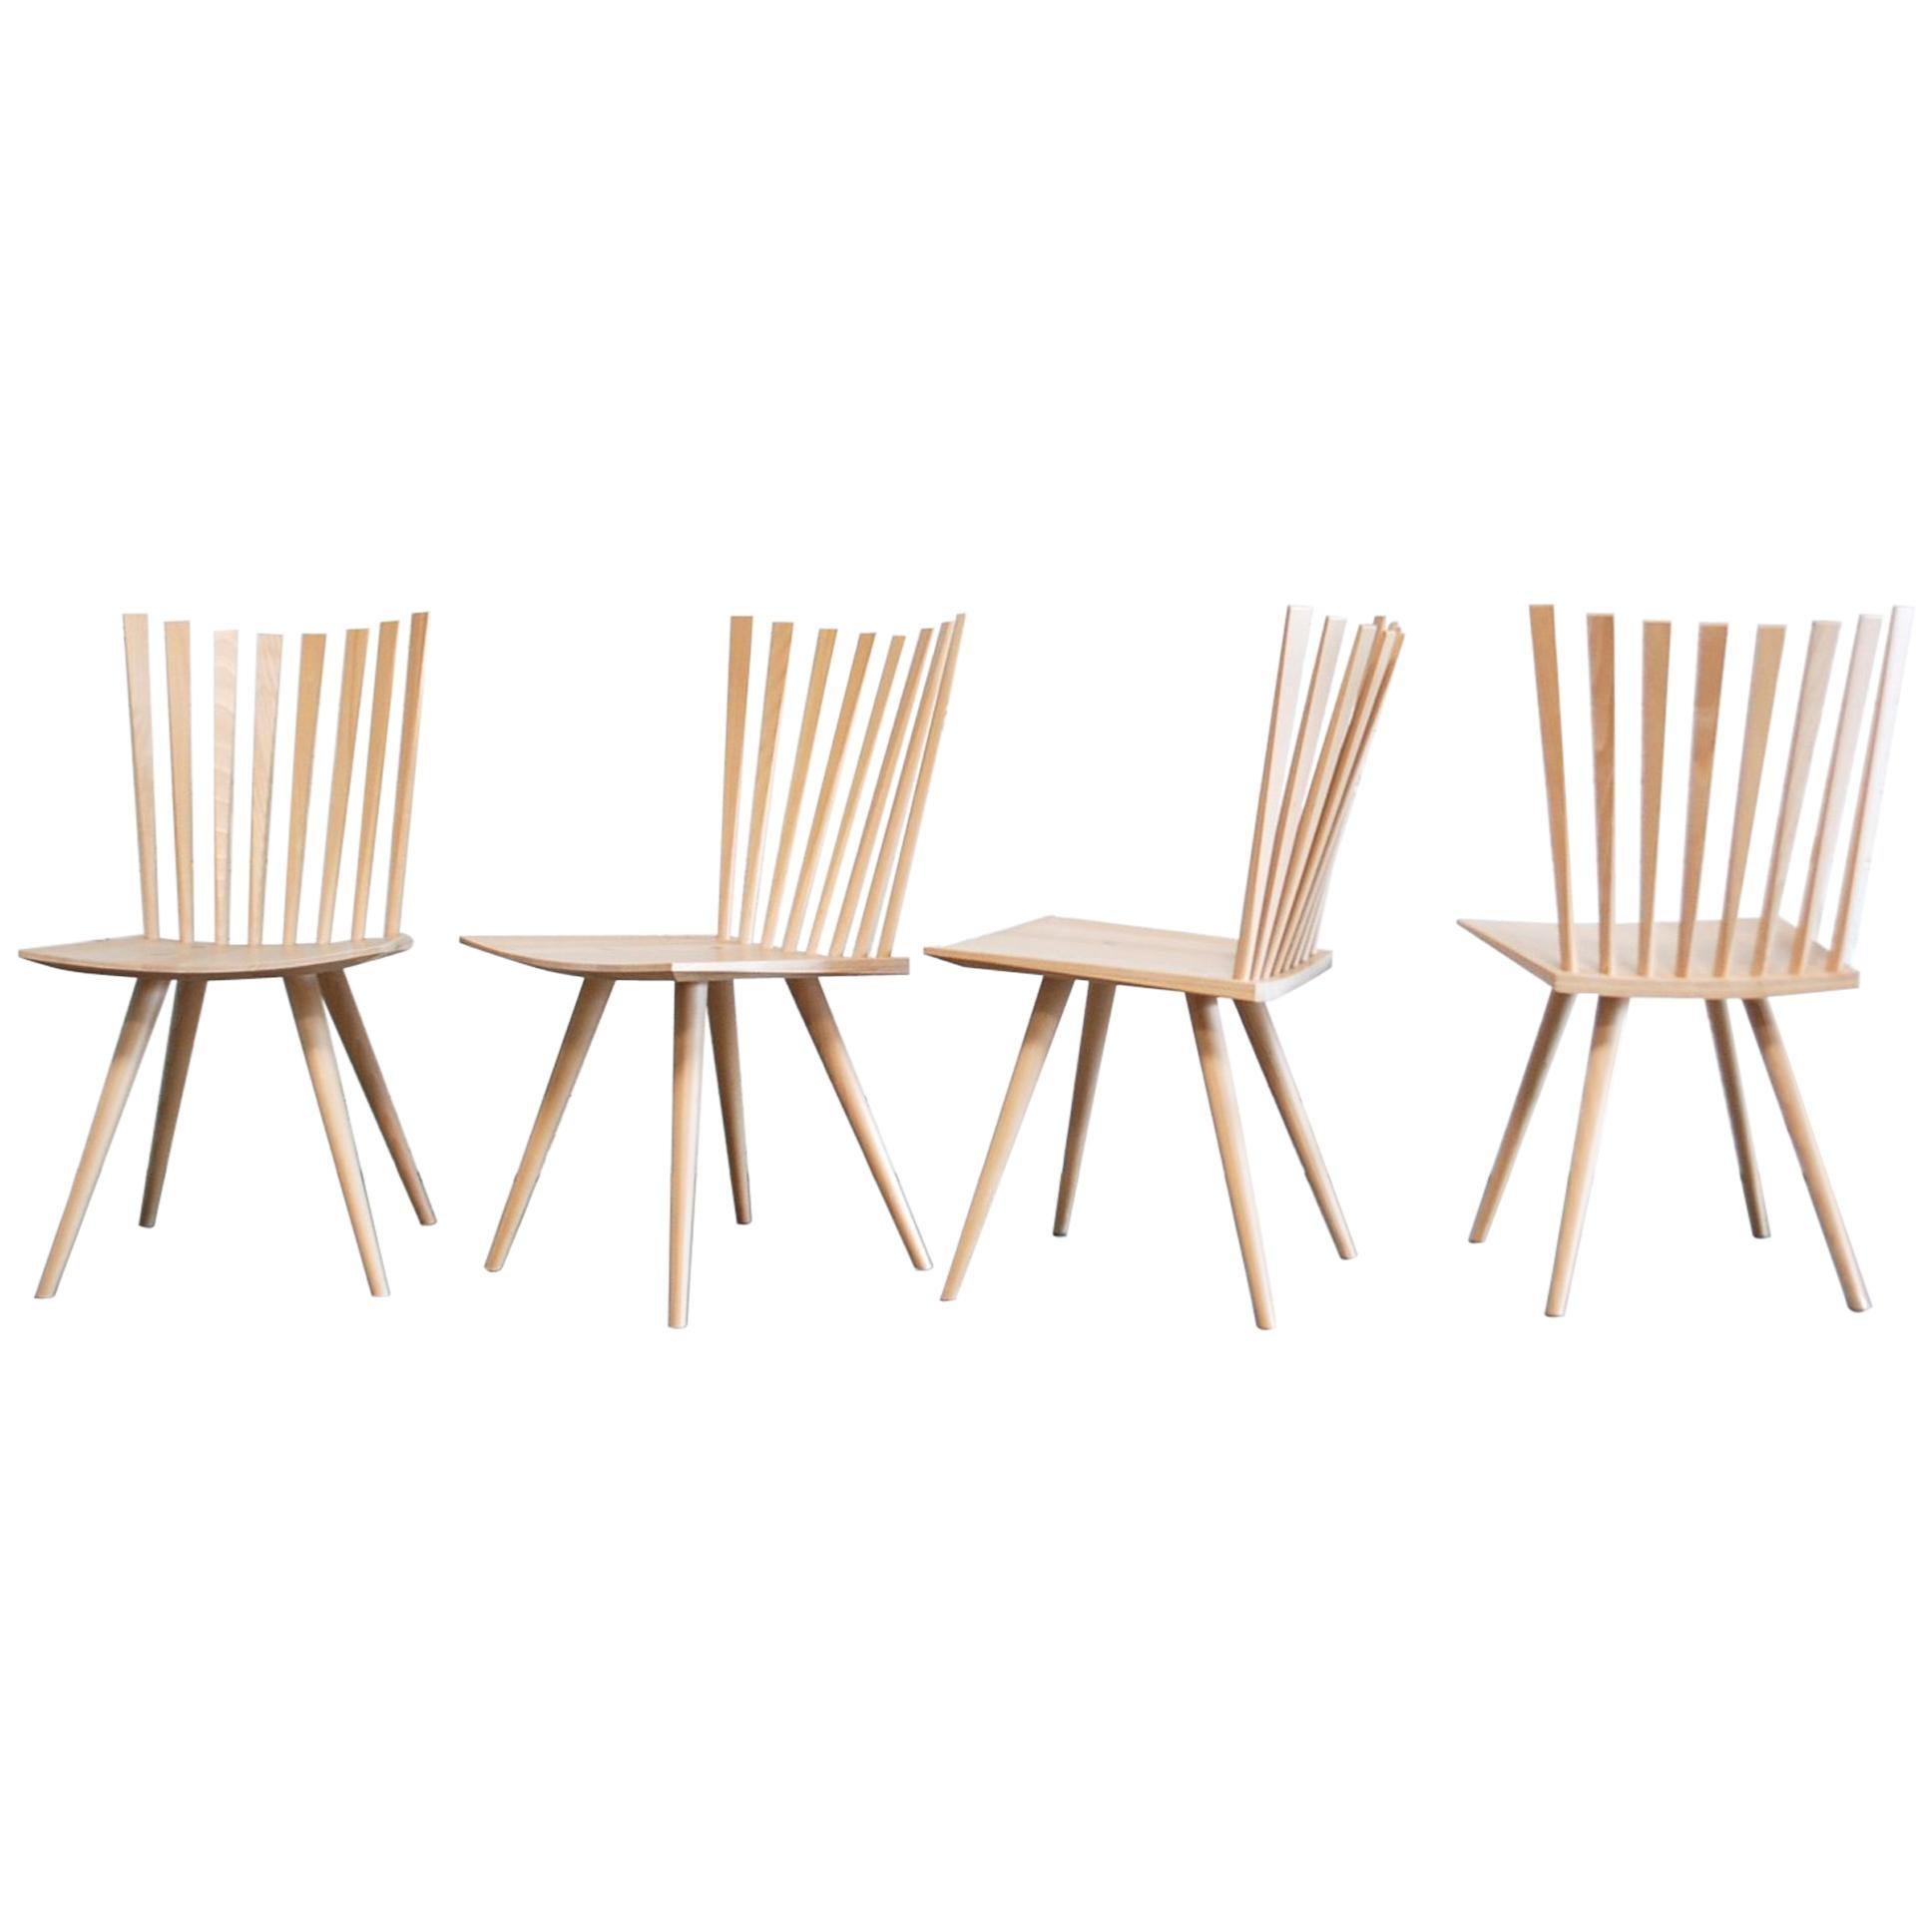 Mikado Dining Chairs Design Foersom & Hiort-Lorenzen by Fredericia